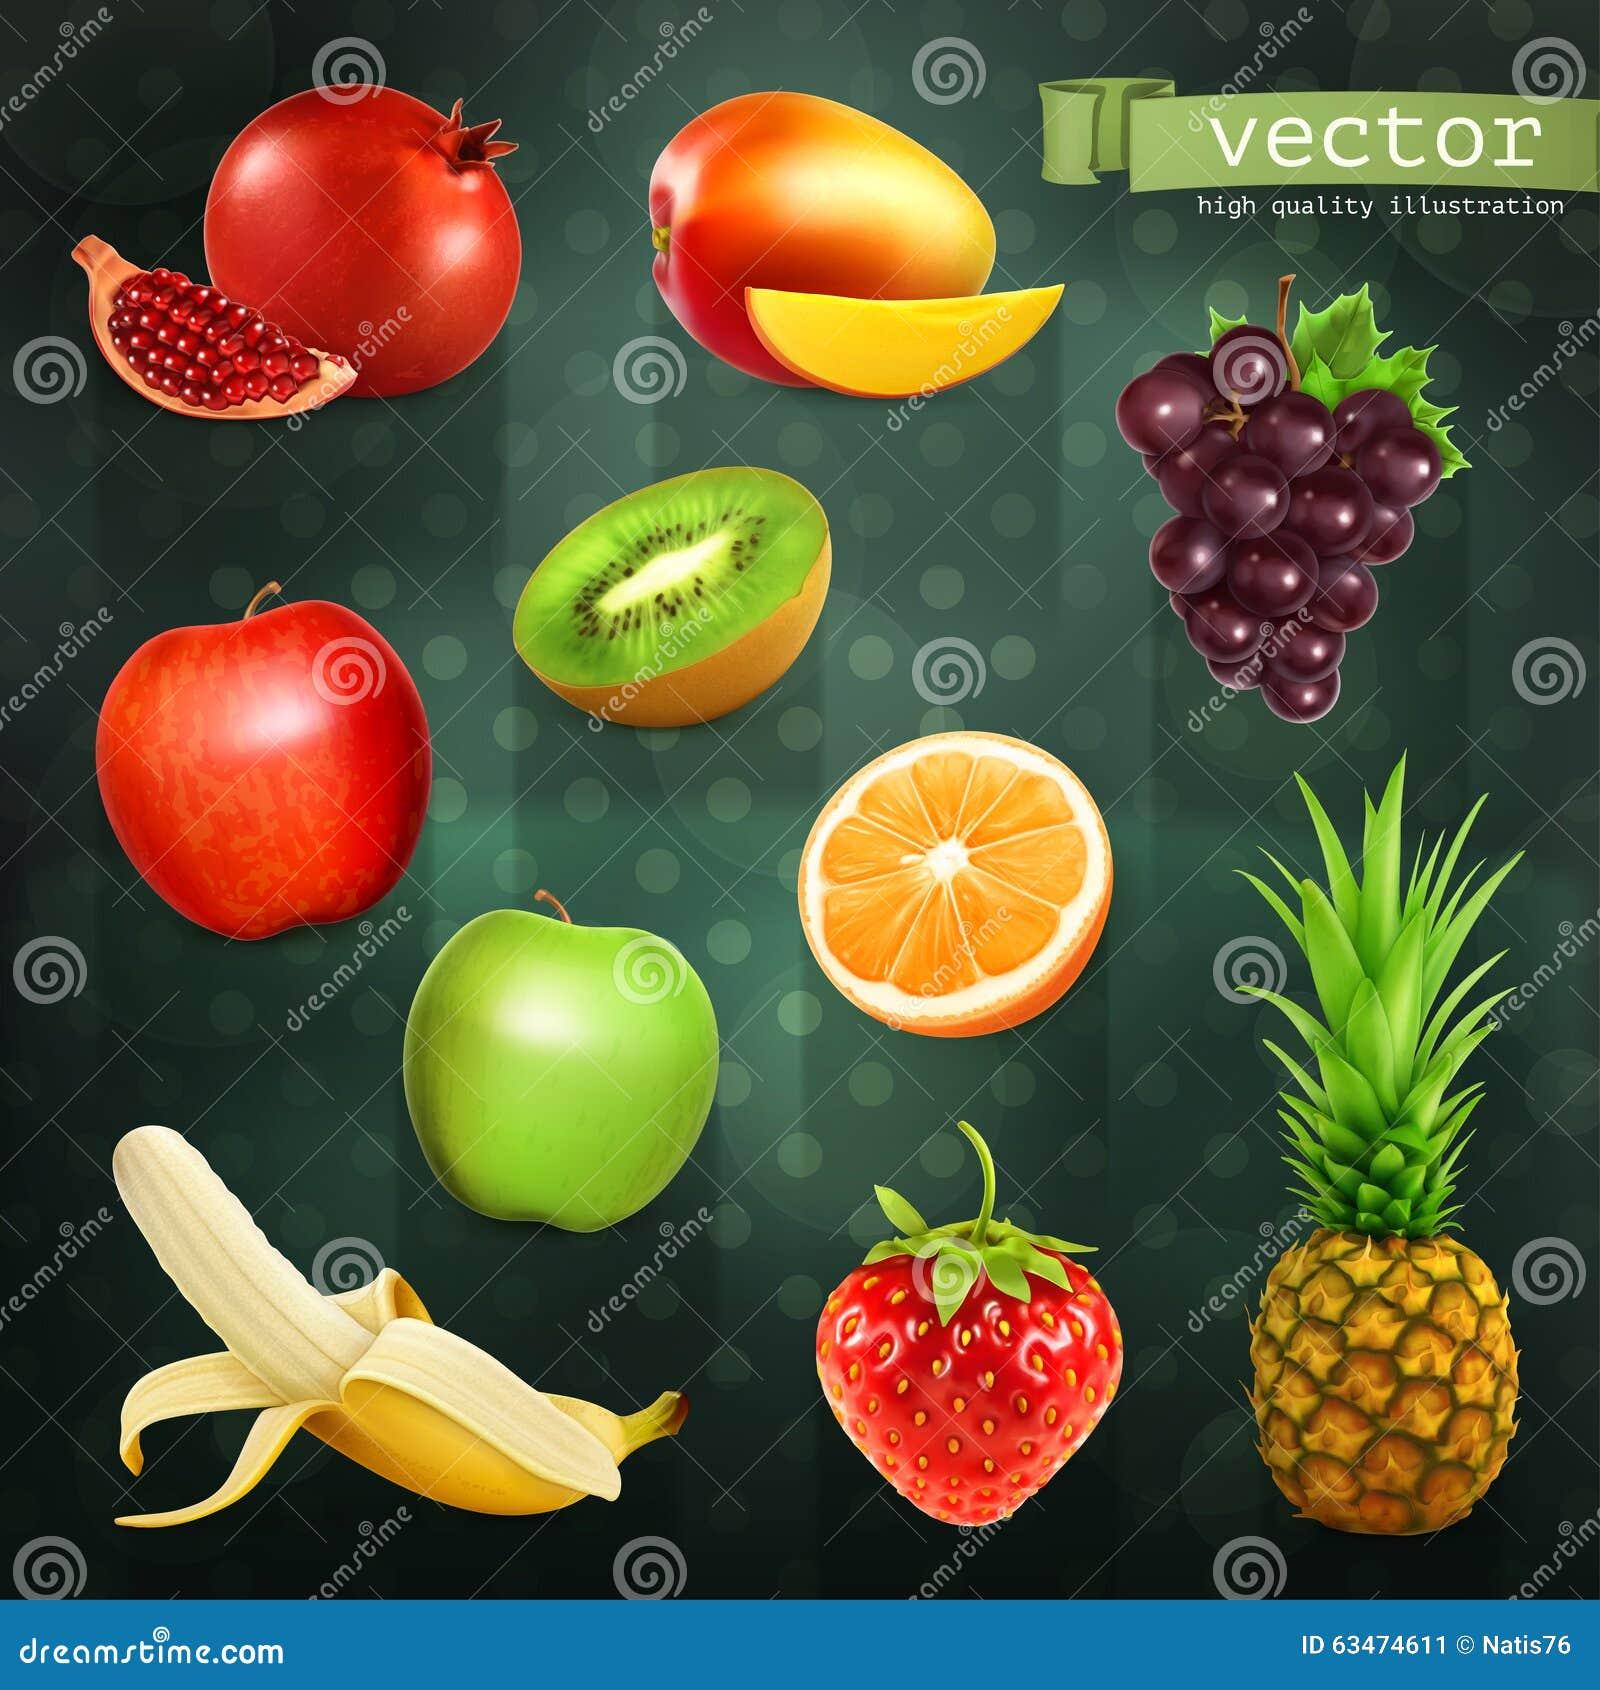 Illustrations de vecteur de fruits illustration de vecteur for Frutas ornamentales